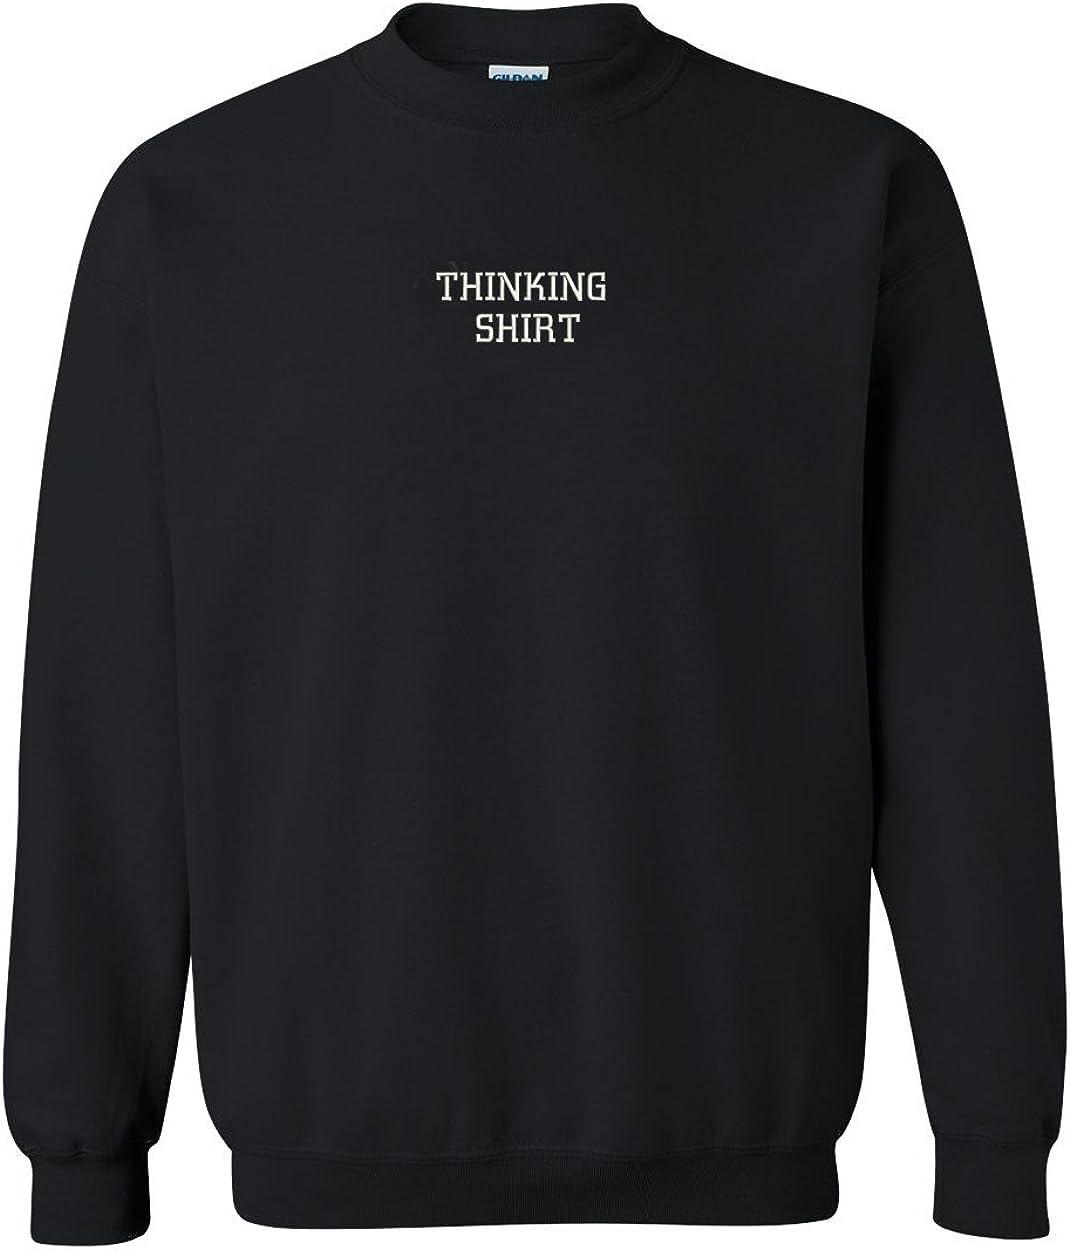 Trendy Apparel Shop Thinking Shirt Embroidered Crewneck Sweatshirt